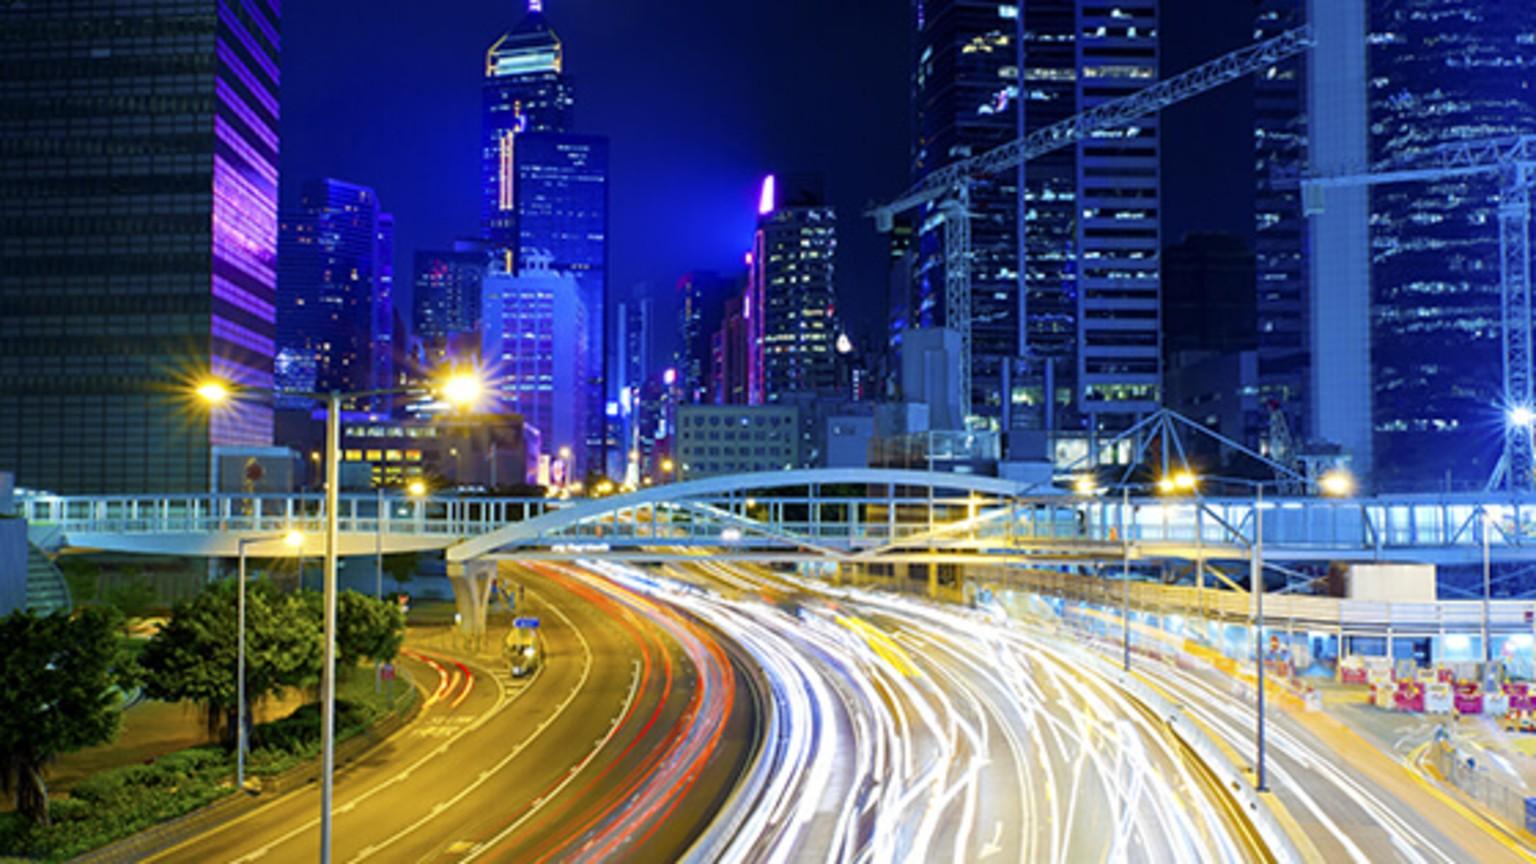 night_traffic_in_city